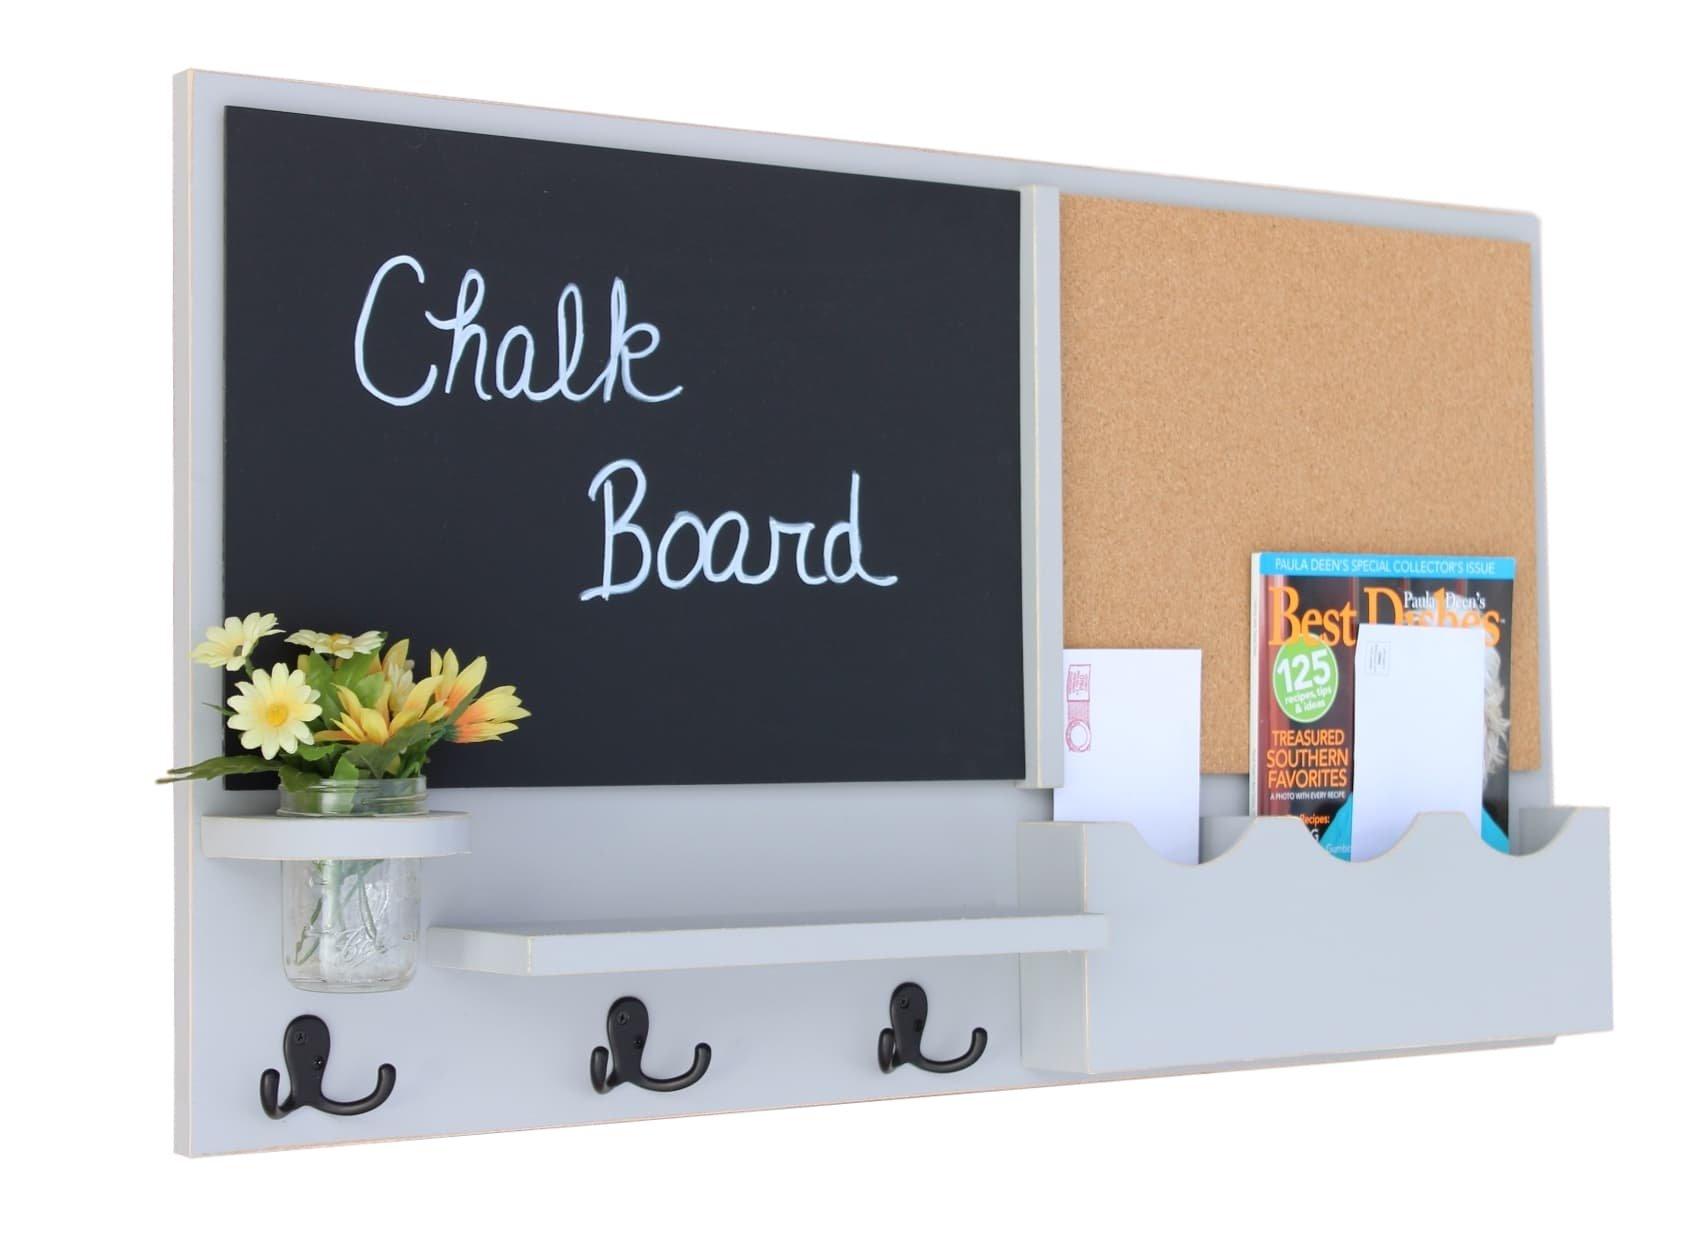 Legacy Studio Décor Message Center with Chalkboard Cork Board Mail Organizer Key Hooks Coat Hooks Mason Jar (Distressed, Gray)